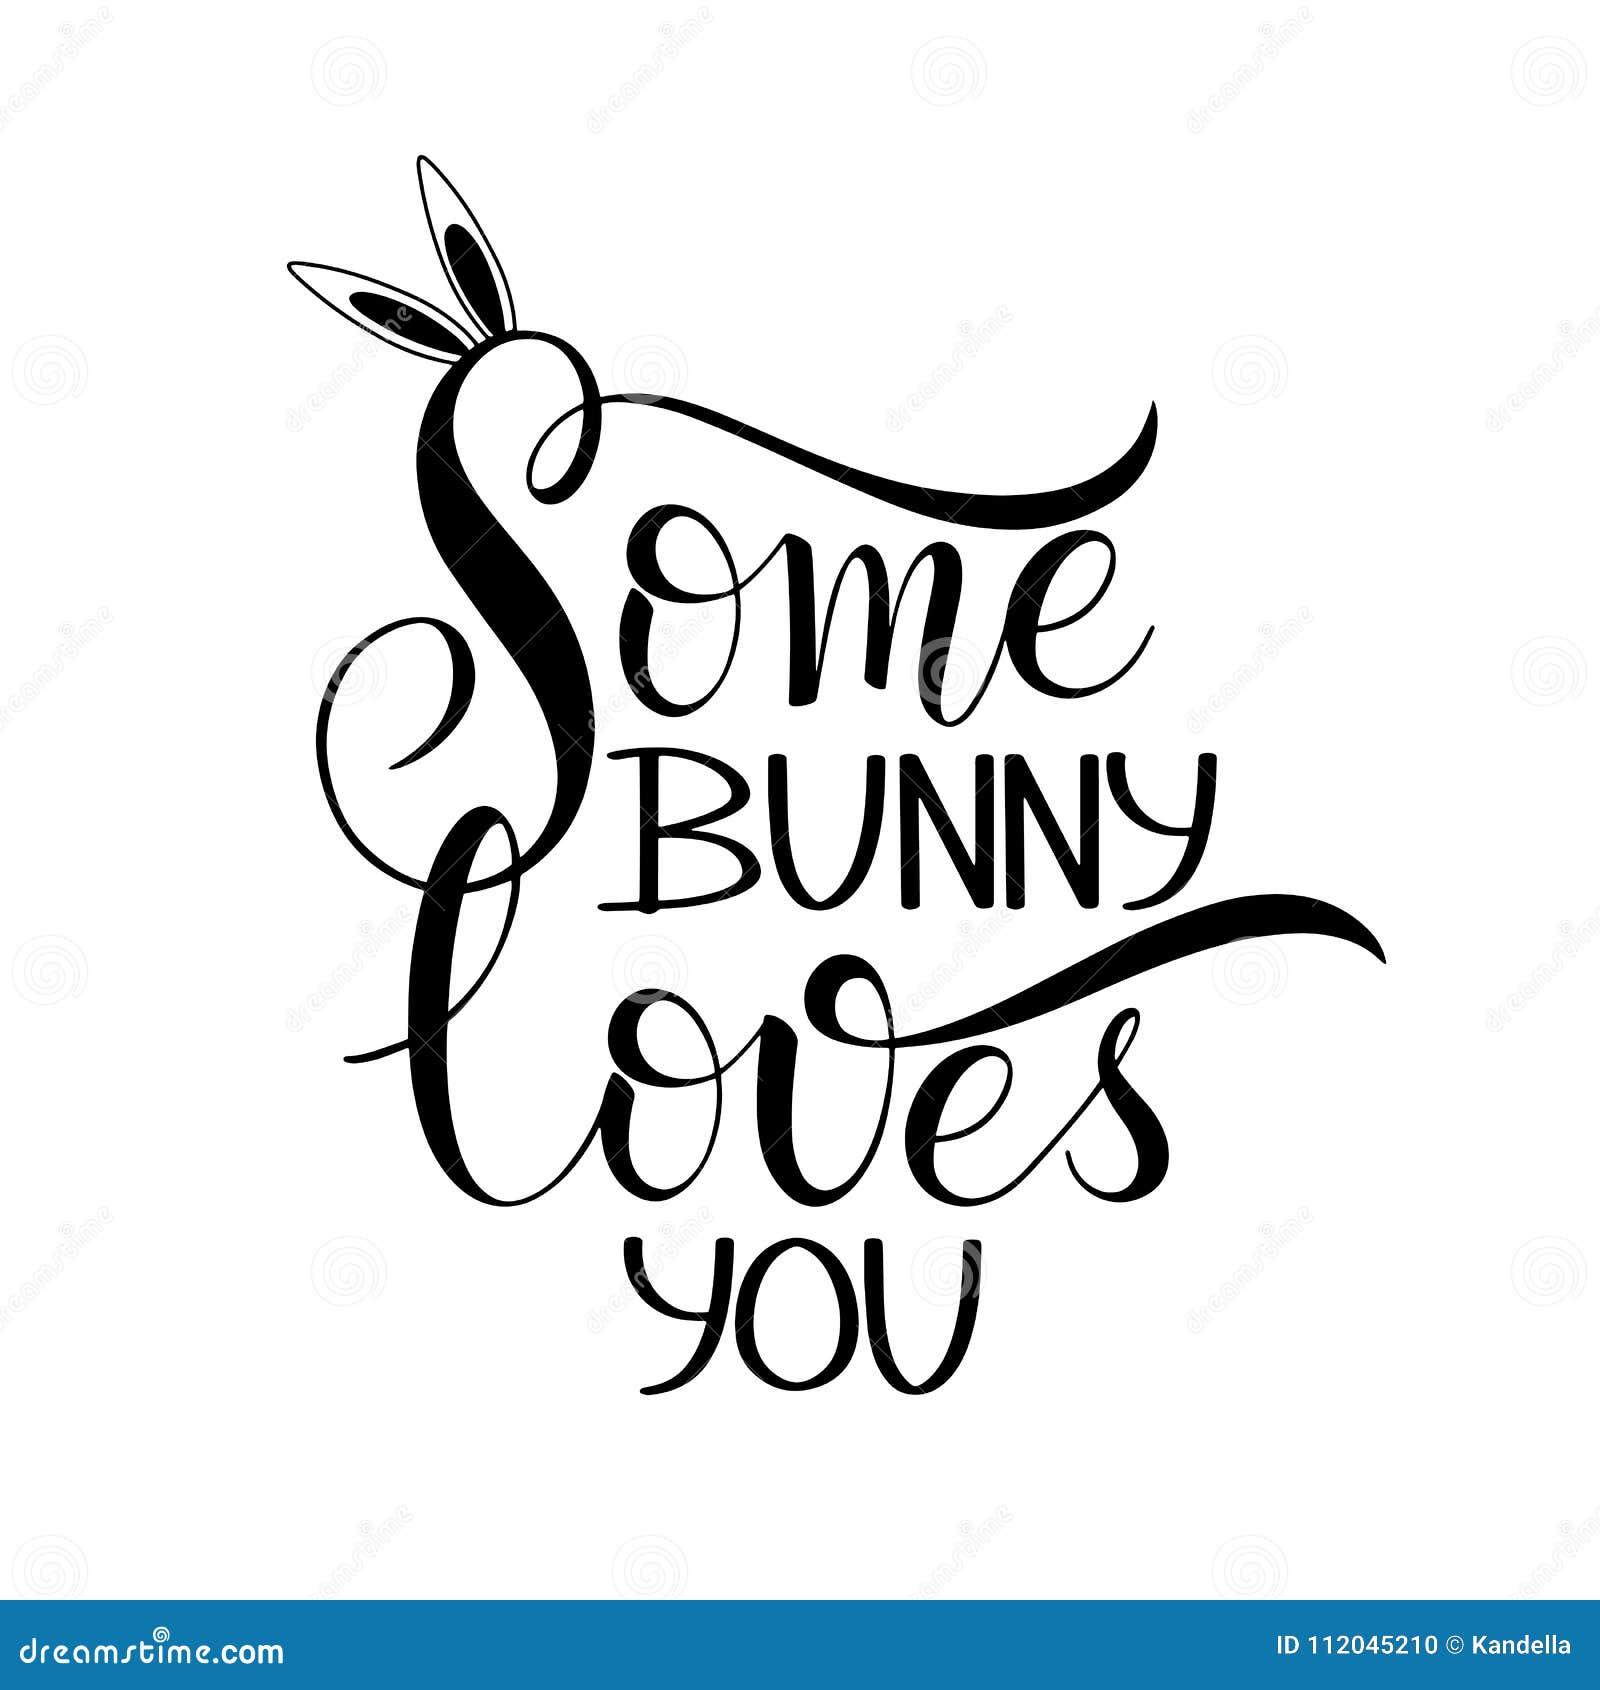 Some bunny loves you lettering stock vector illustration of hand written easter phrases seasons greetings m4hsunfo